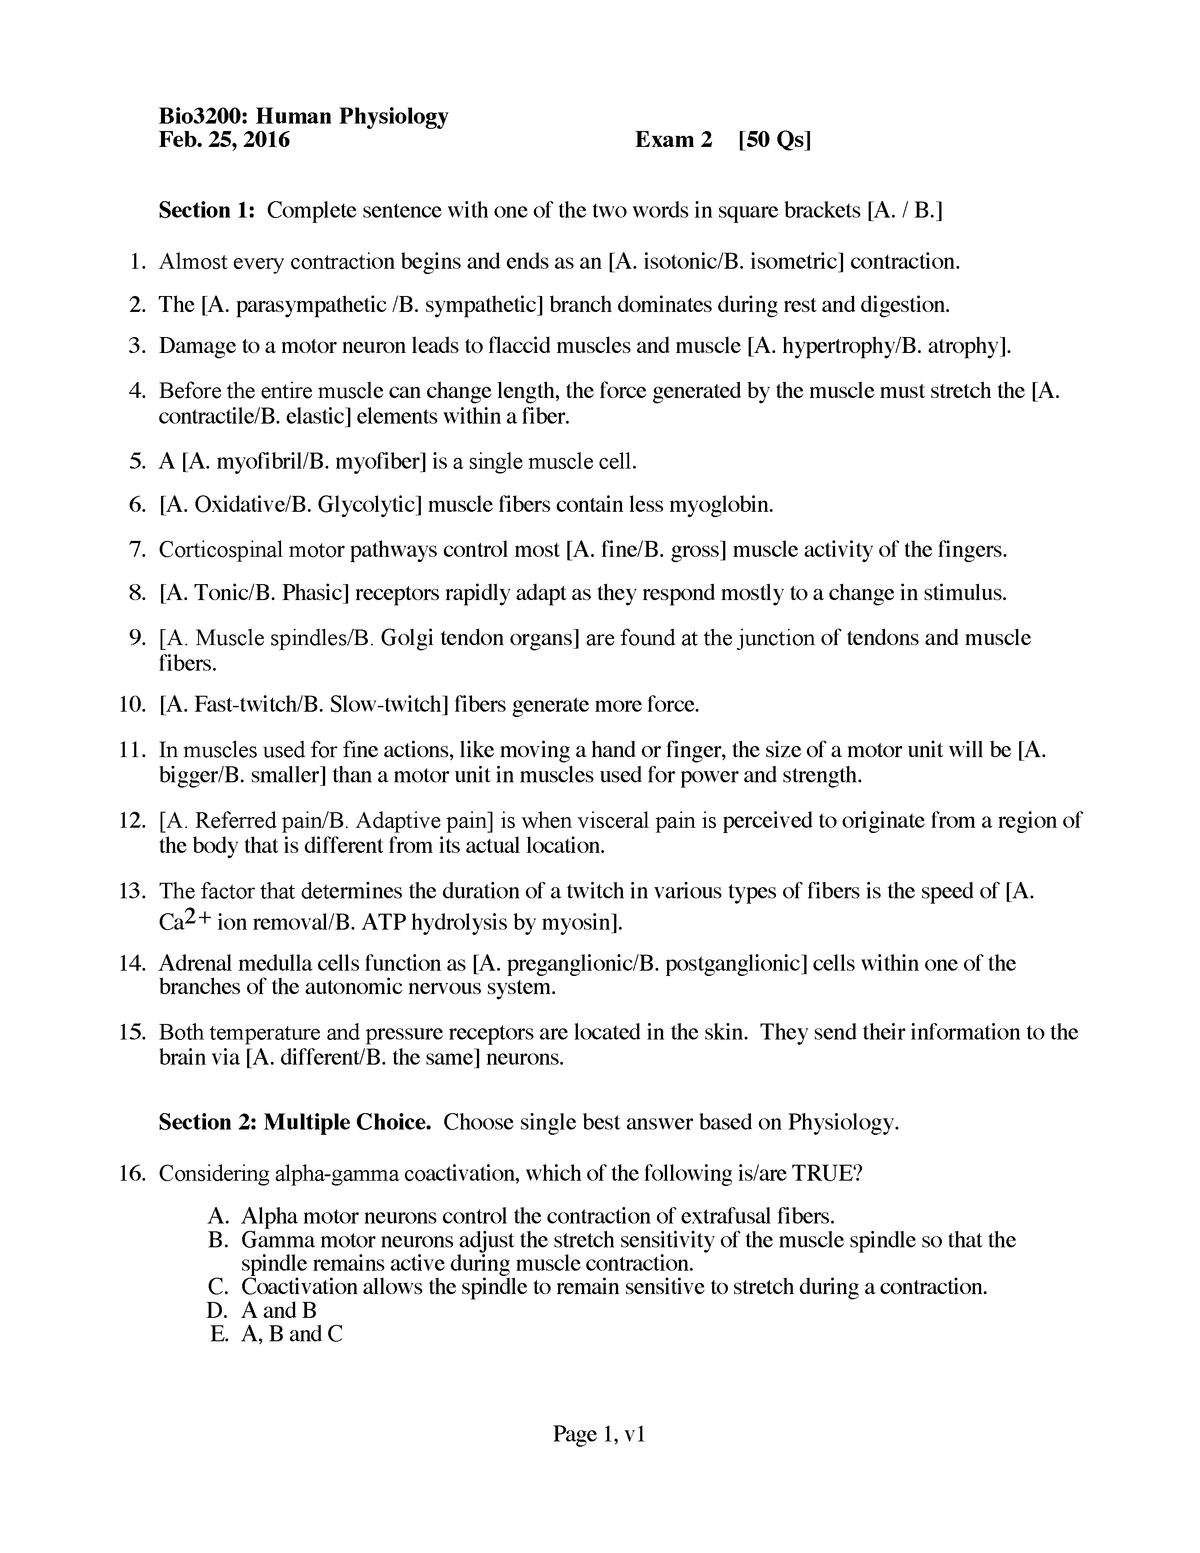 Exam 2018 - BIO 3200: Human Physiology - StuDocu